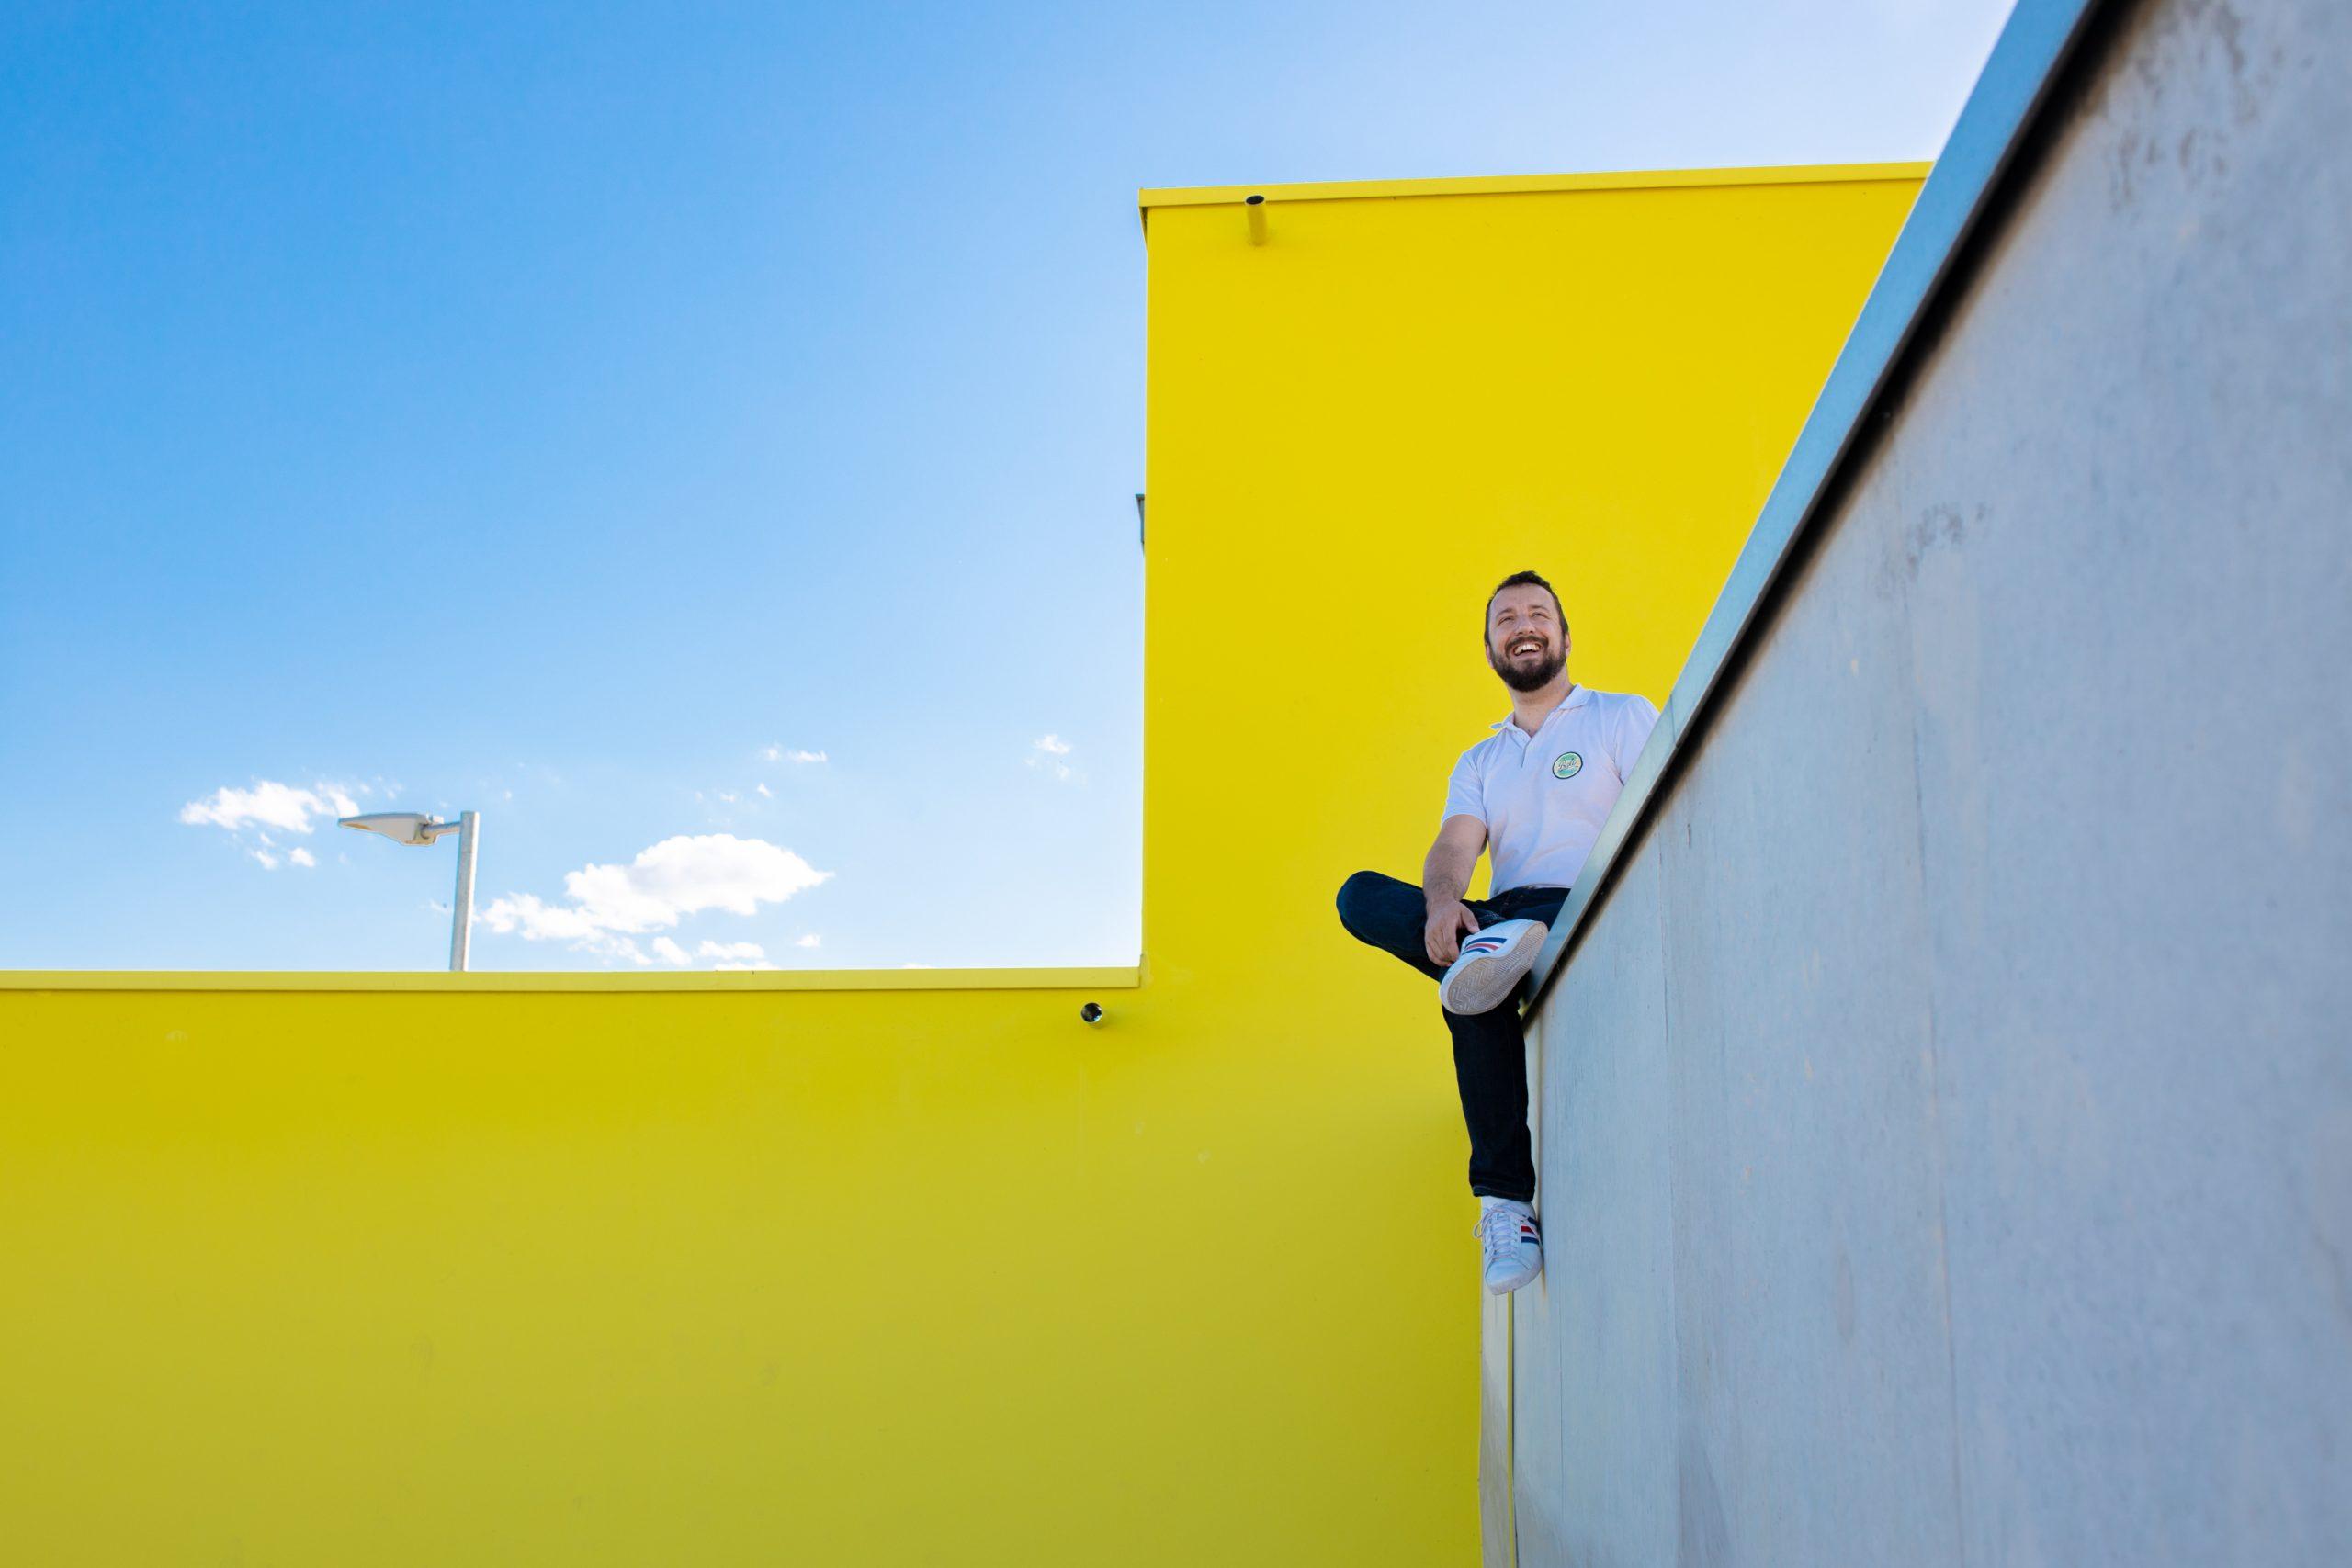 Michael Bouton, Photographe